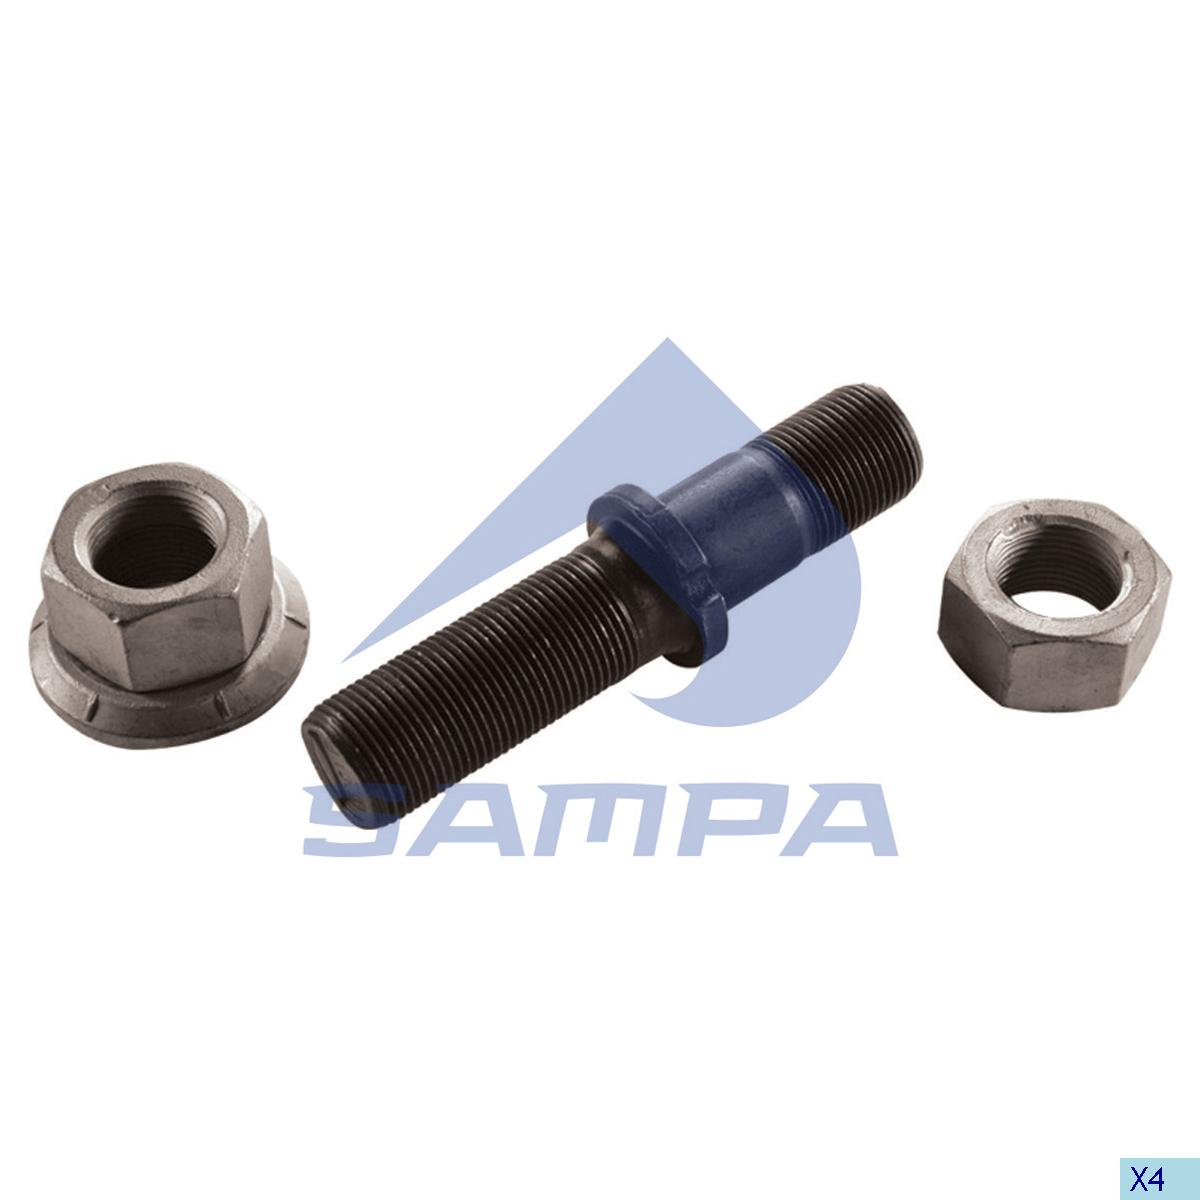 Repair Kit, Stud, Sauer, Power Unit